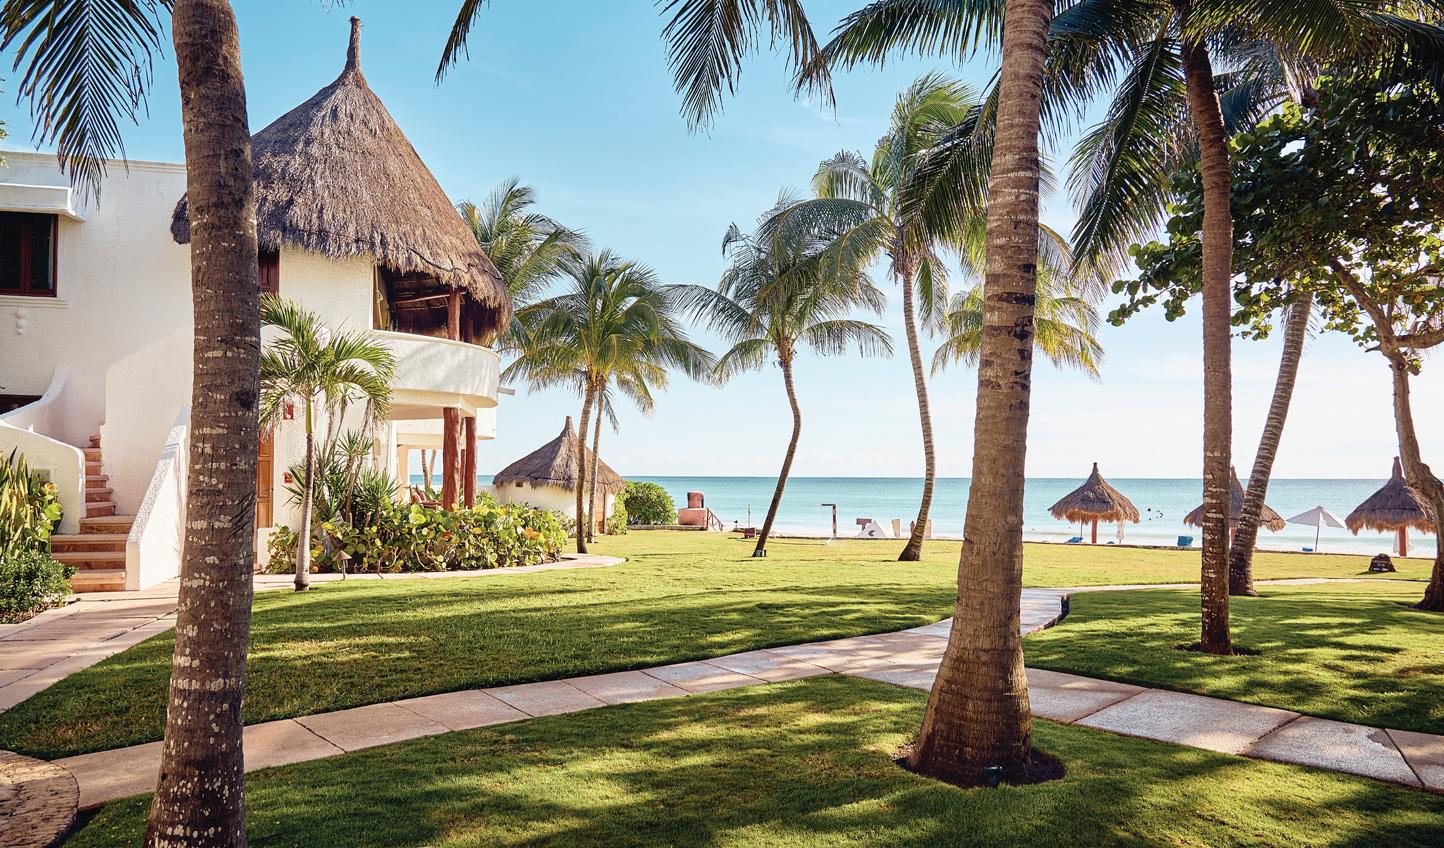 Stroll the tropical gardens